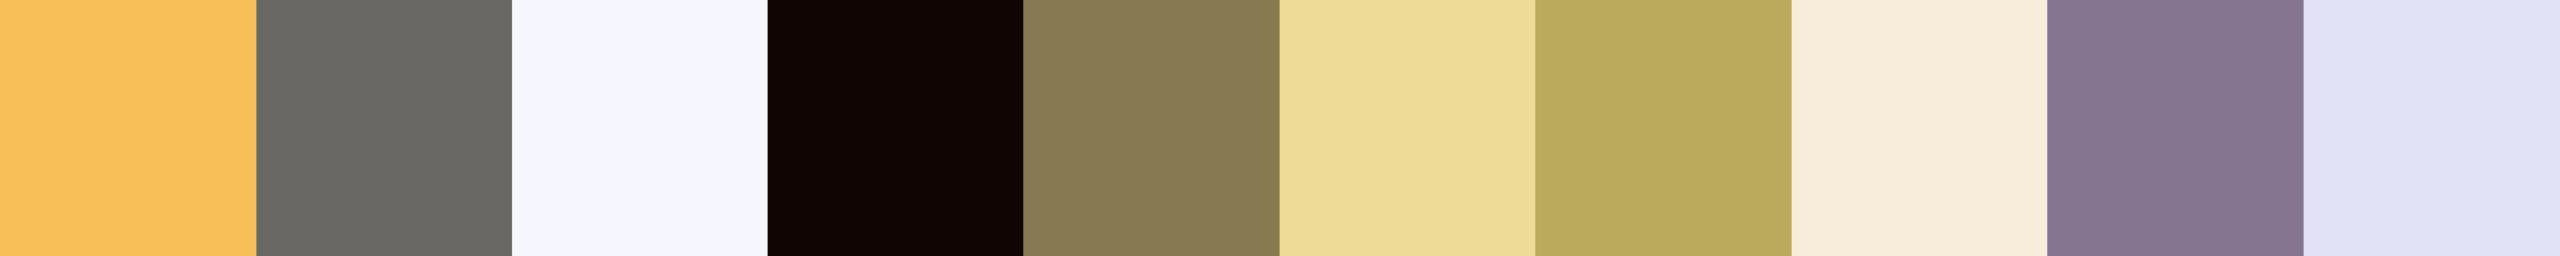 50 Secrenta Color Palette